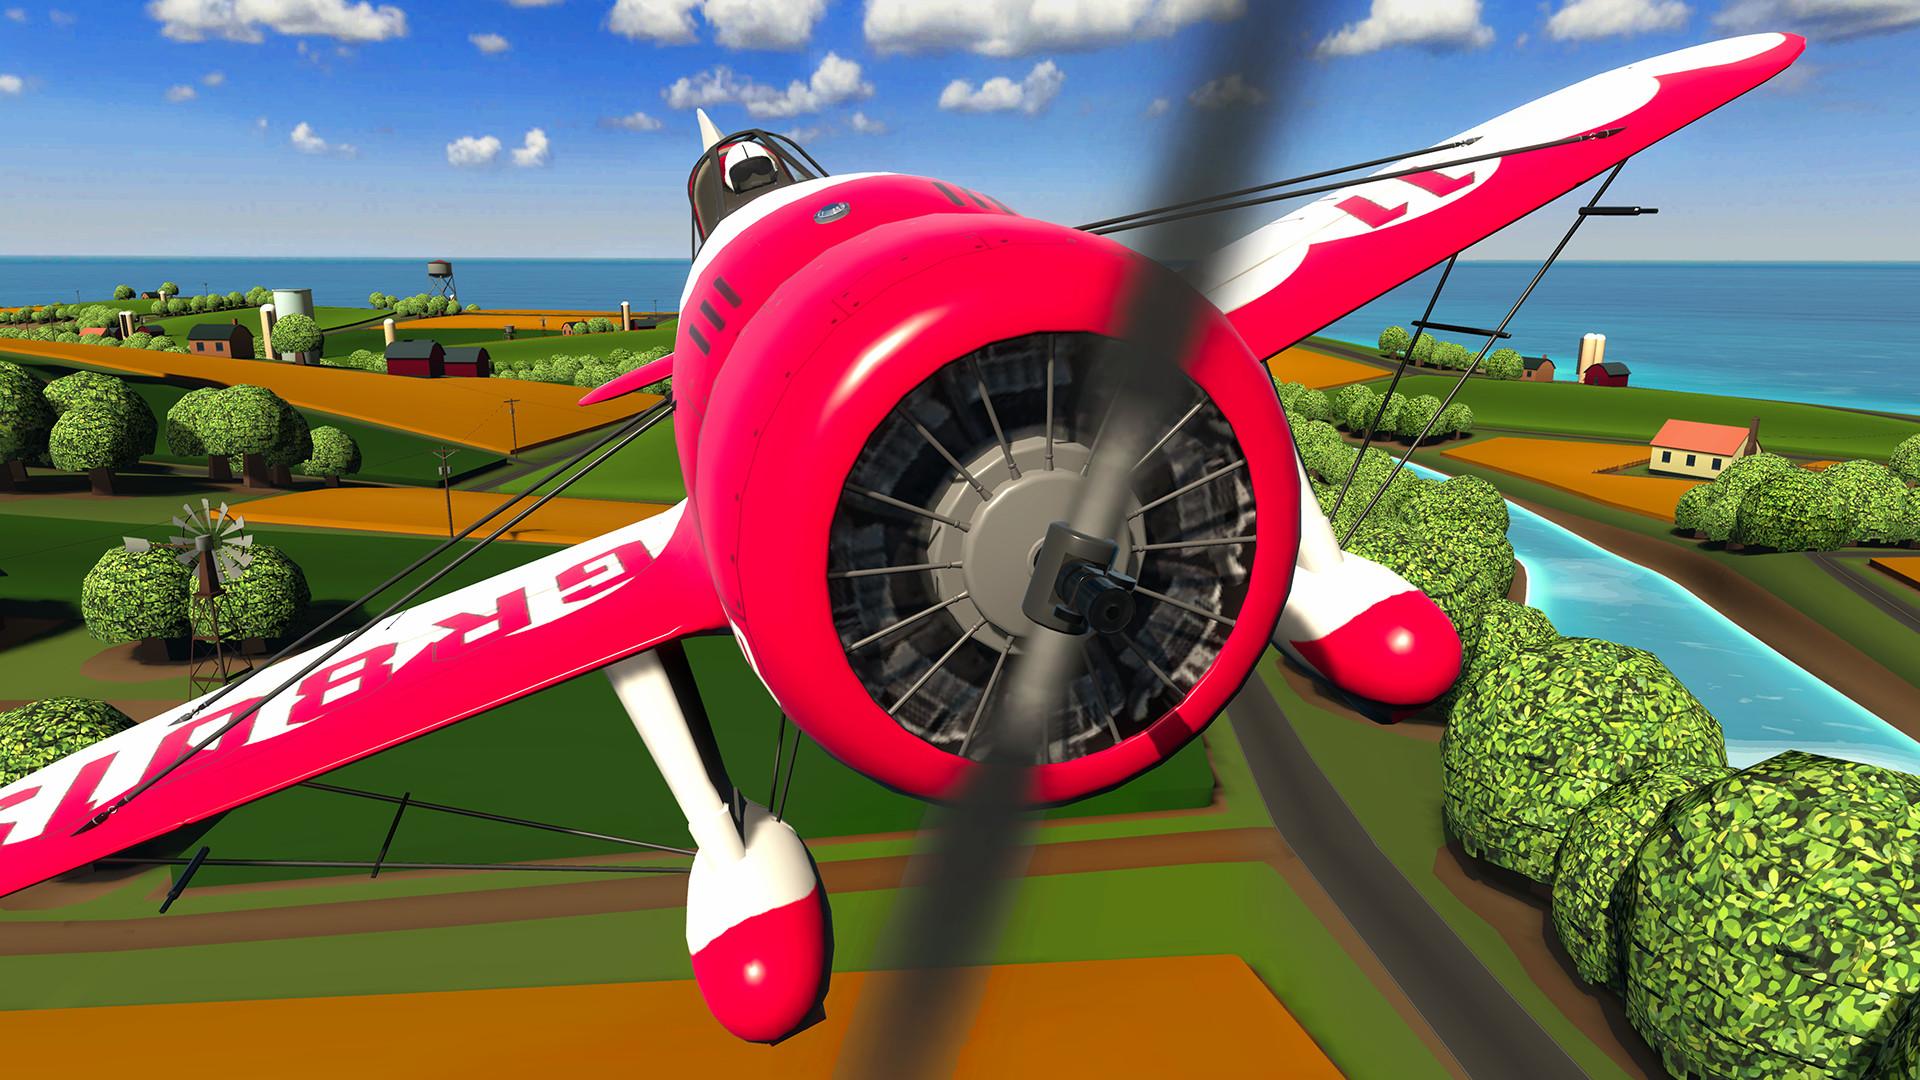 Oculus Quest 游戏《Ultrawings》模拟飞行插图(3)